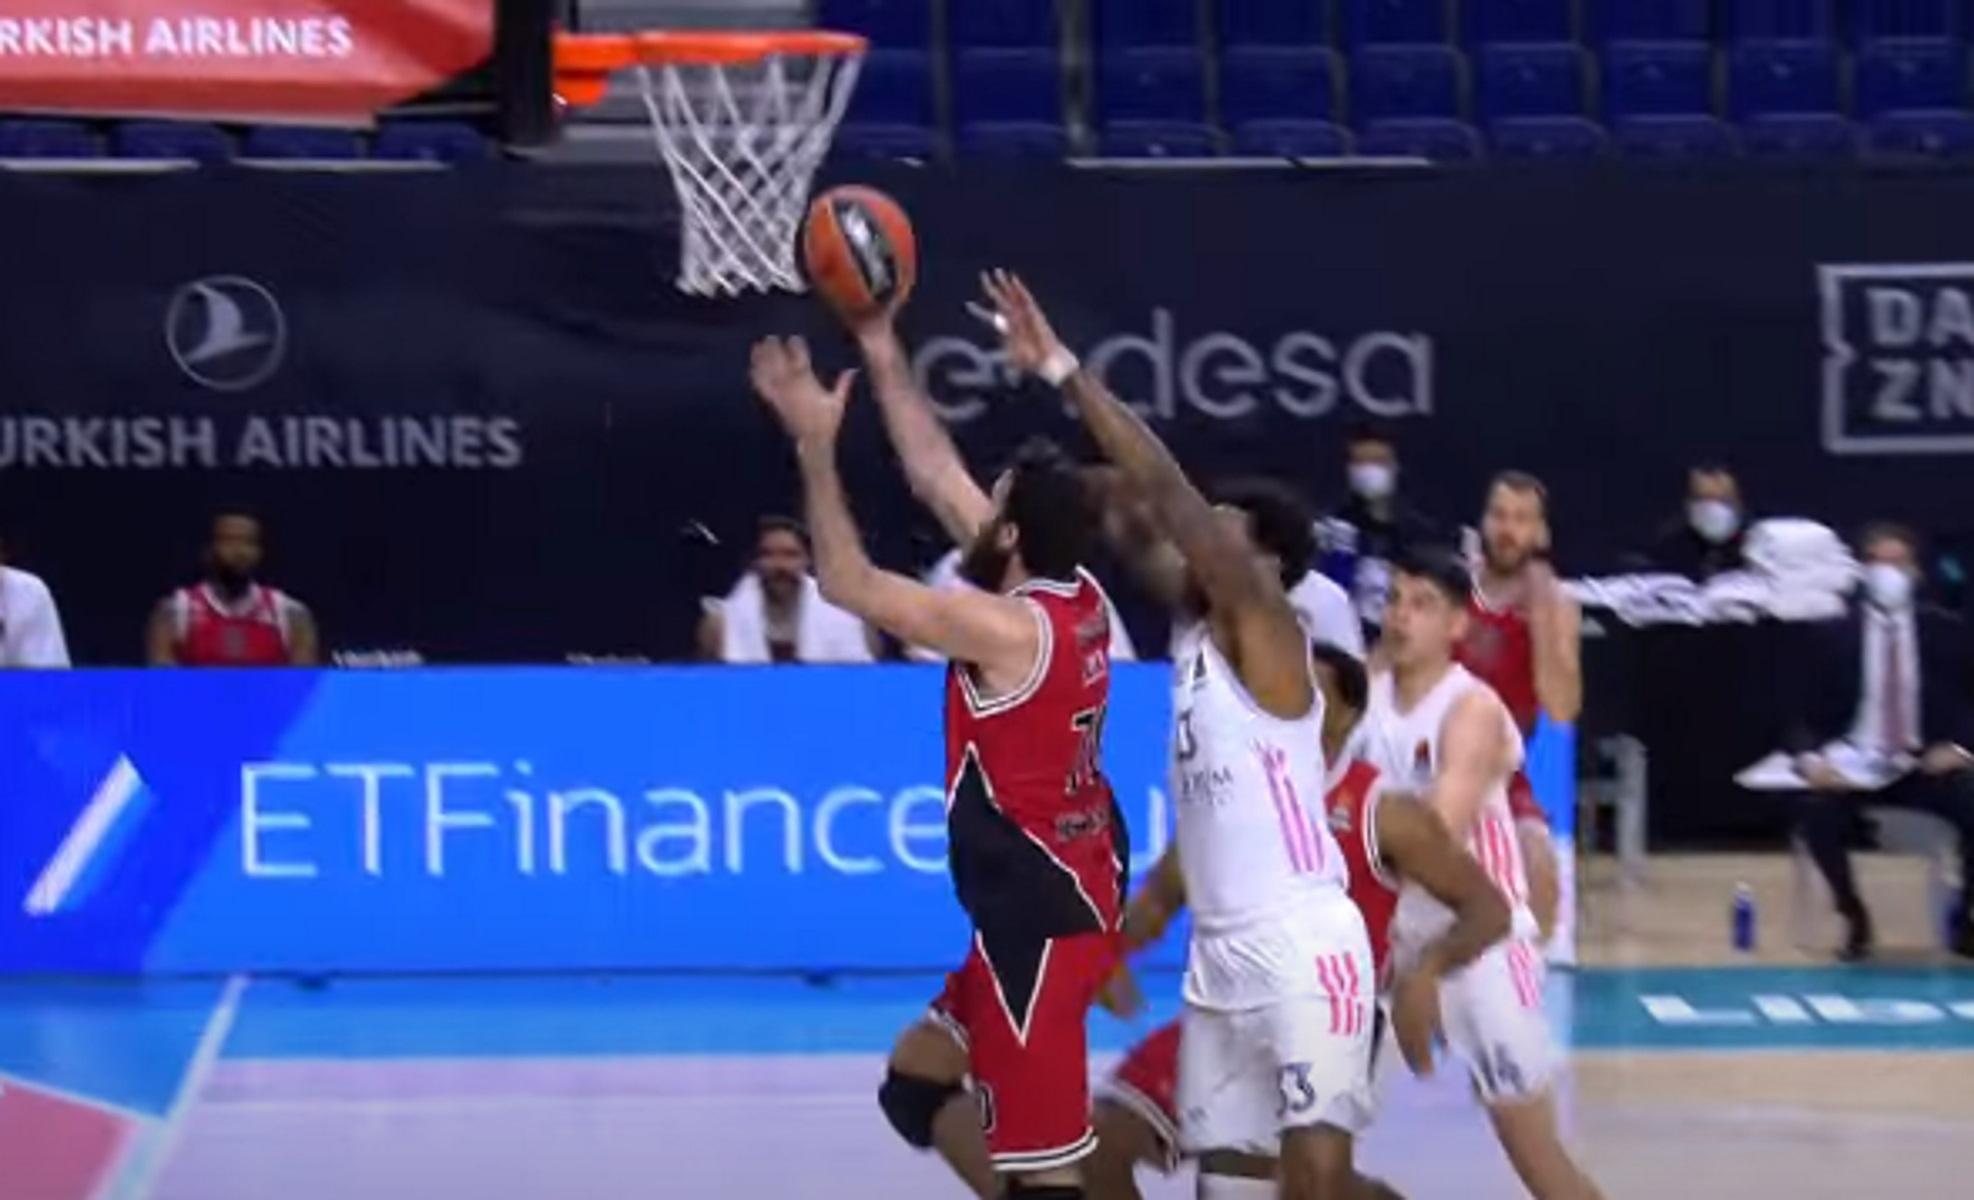 Euroleague: Μεγάλο «διπλό» της Αρμάνι στη Μαδρίτη – «Ξέσπασε» η Εφές στη Γαλλία (videos)